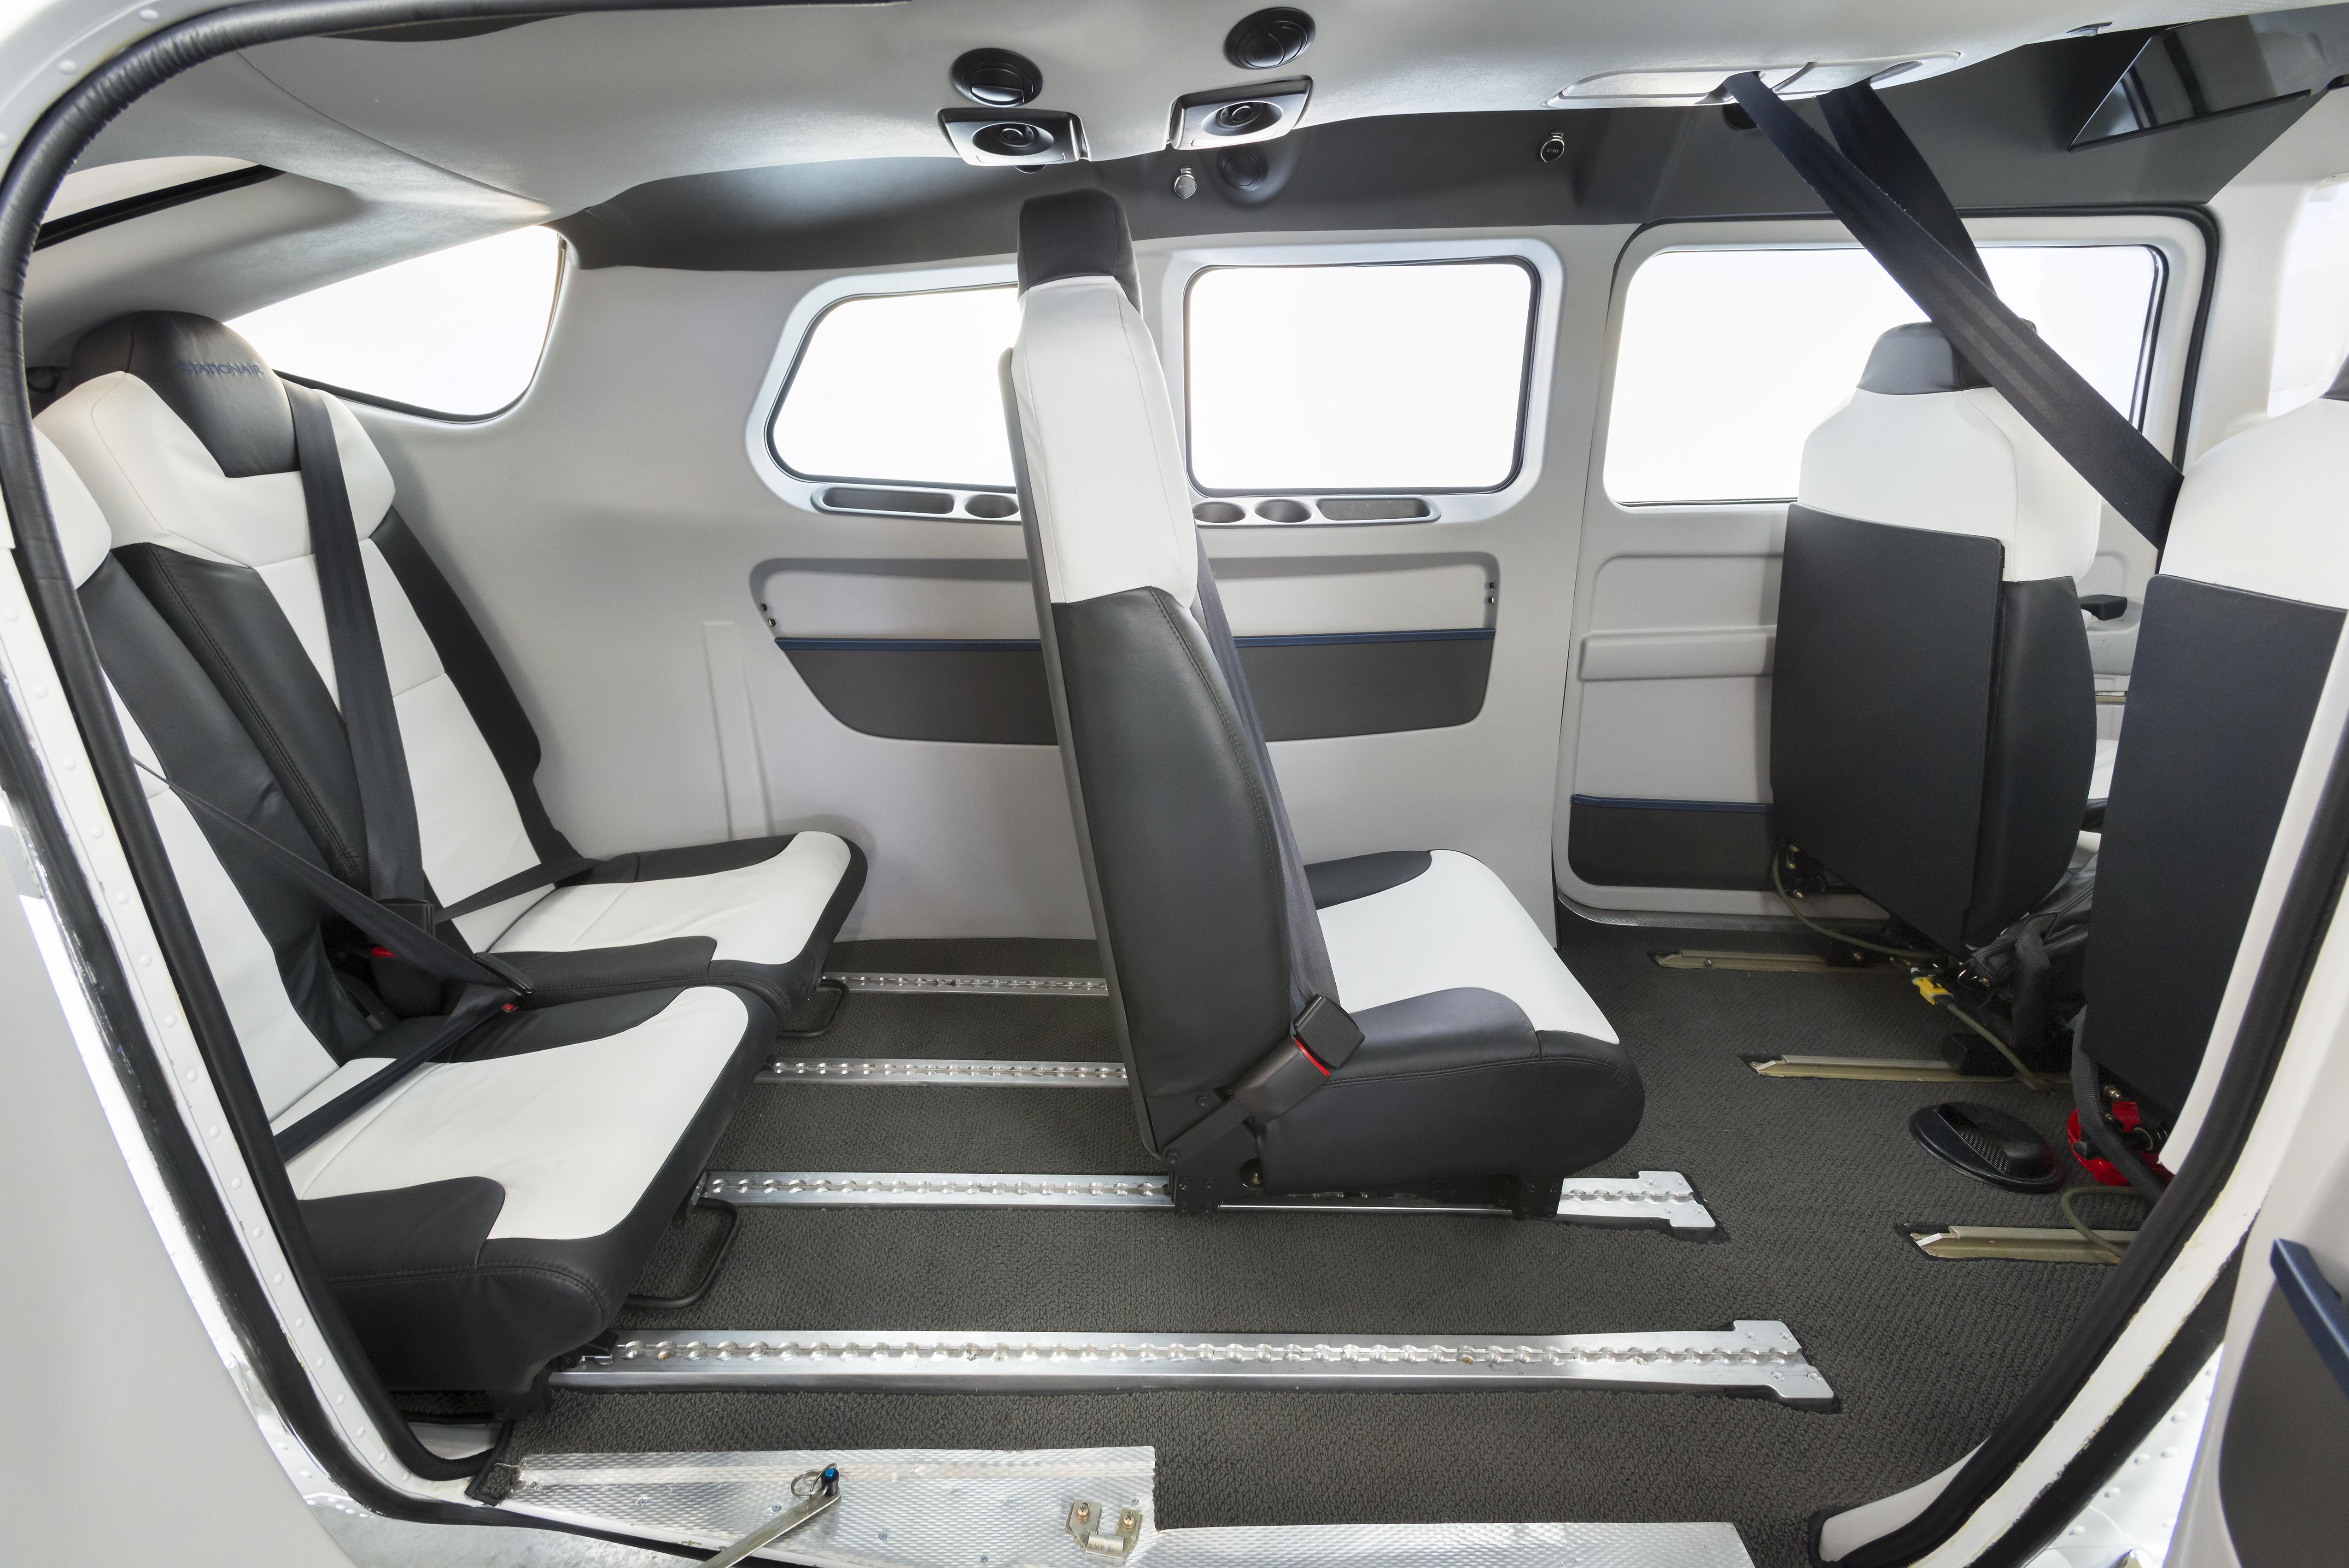 Textron Inc - Cessna Stationair to sport new interior seating option